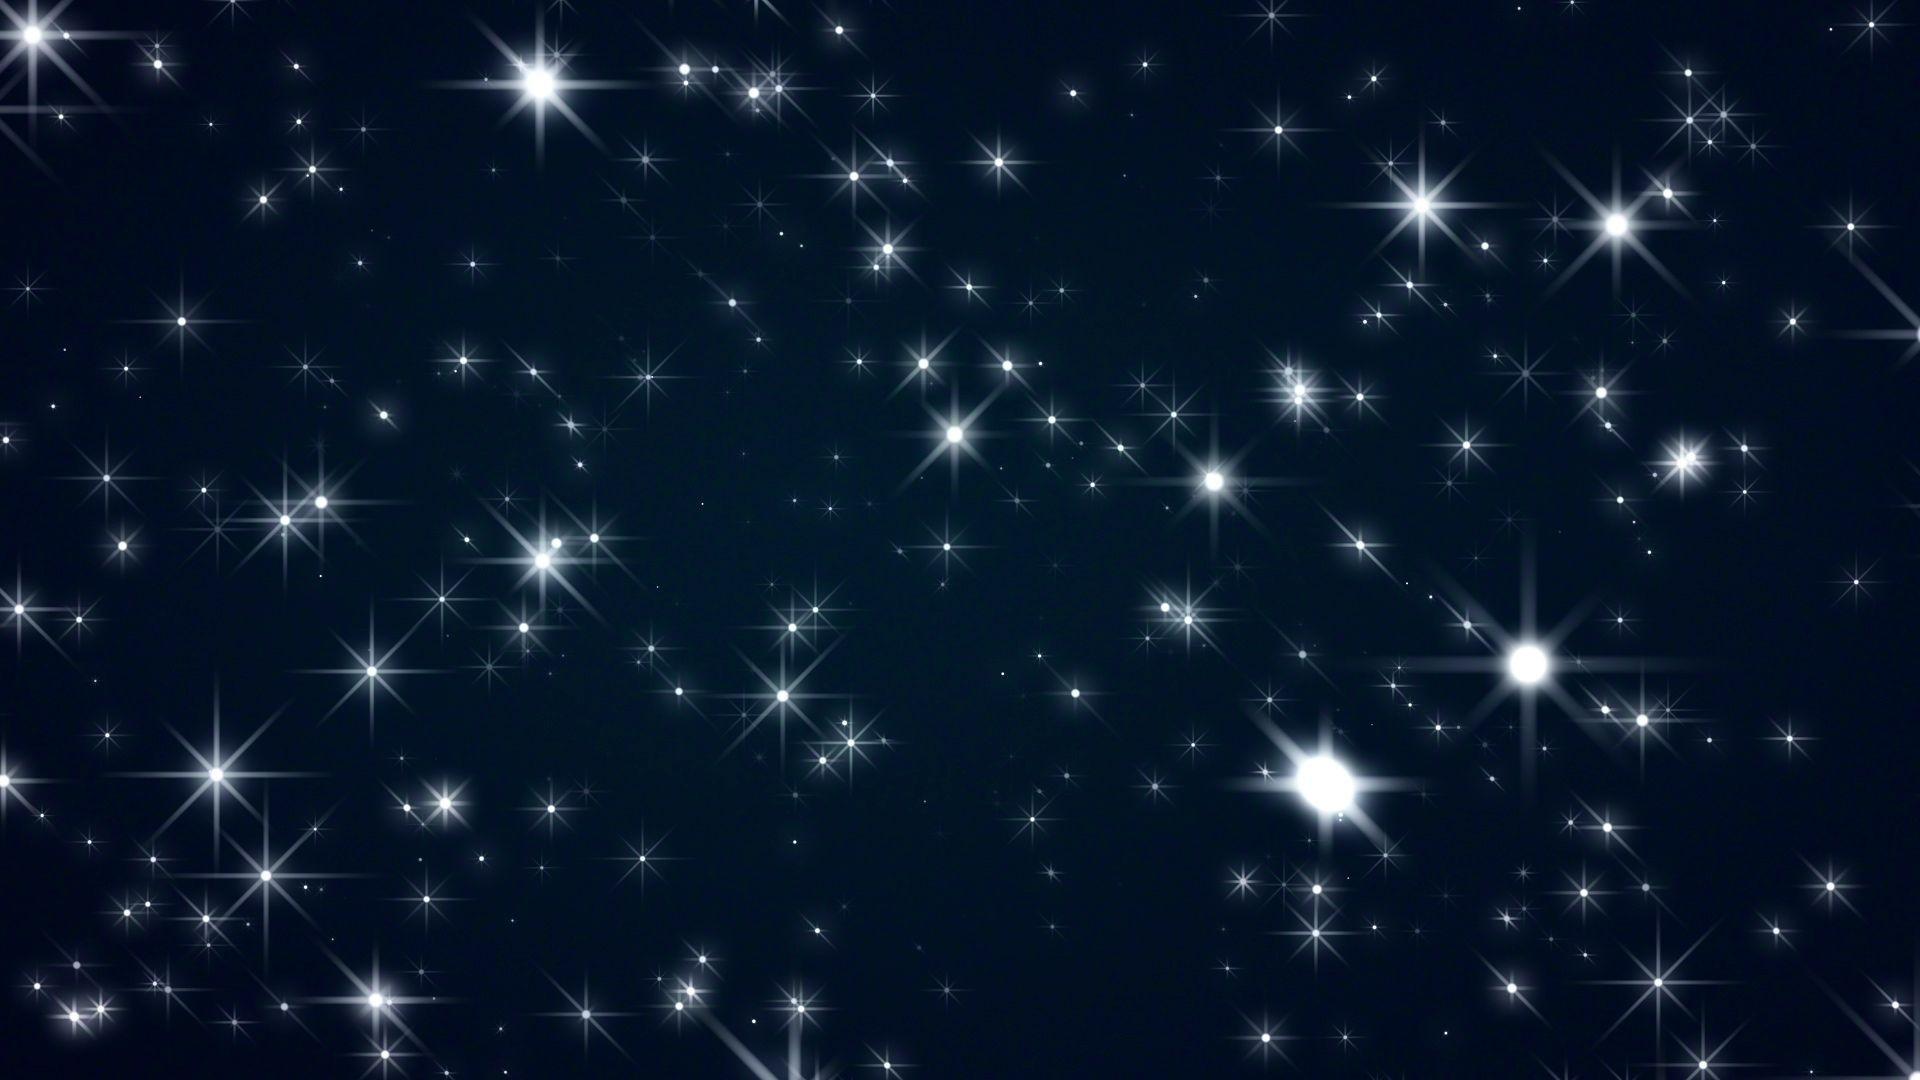 space stars background  u00b7 u2460 download free high resolution